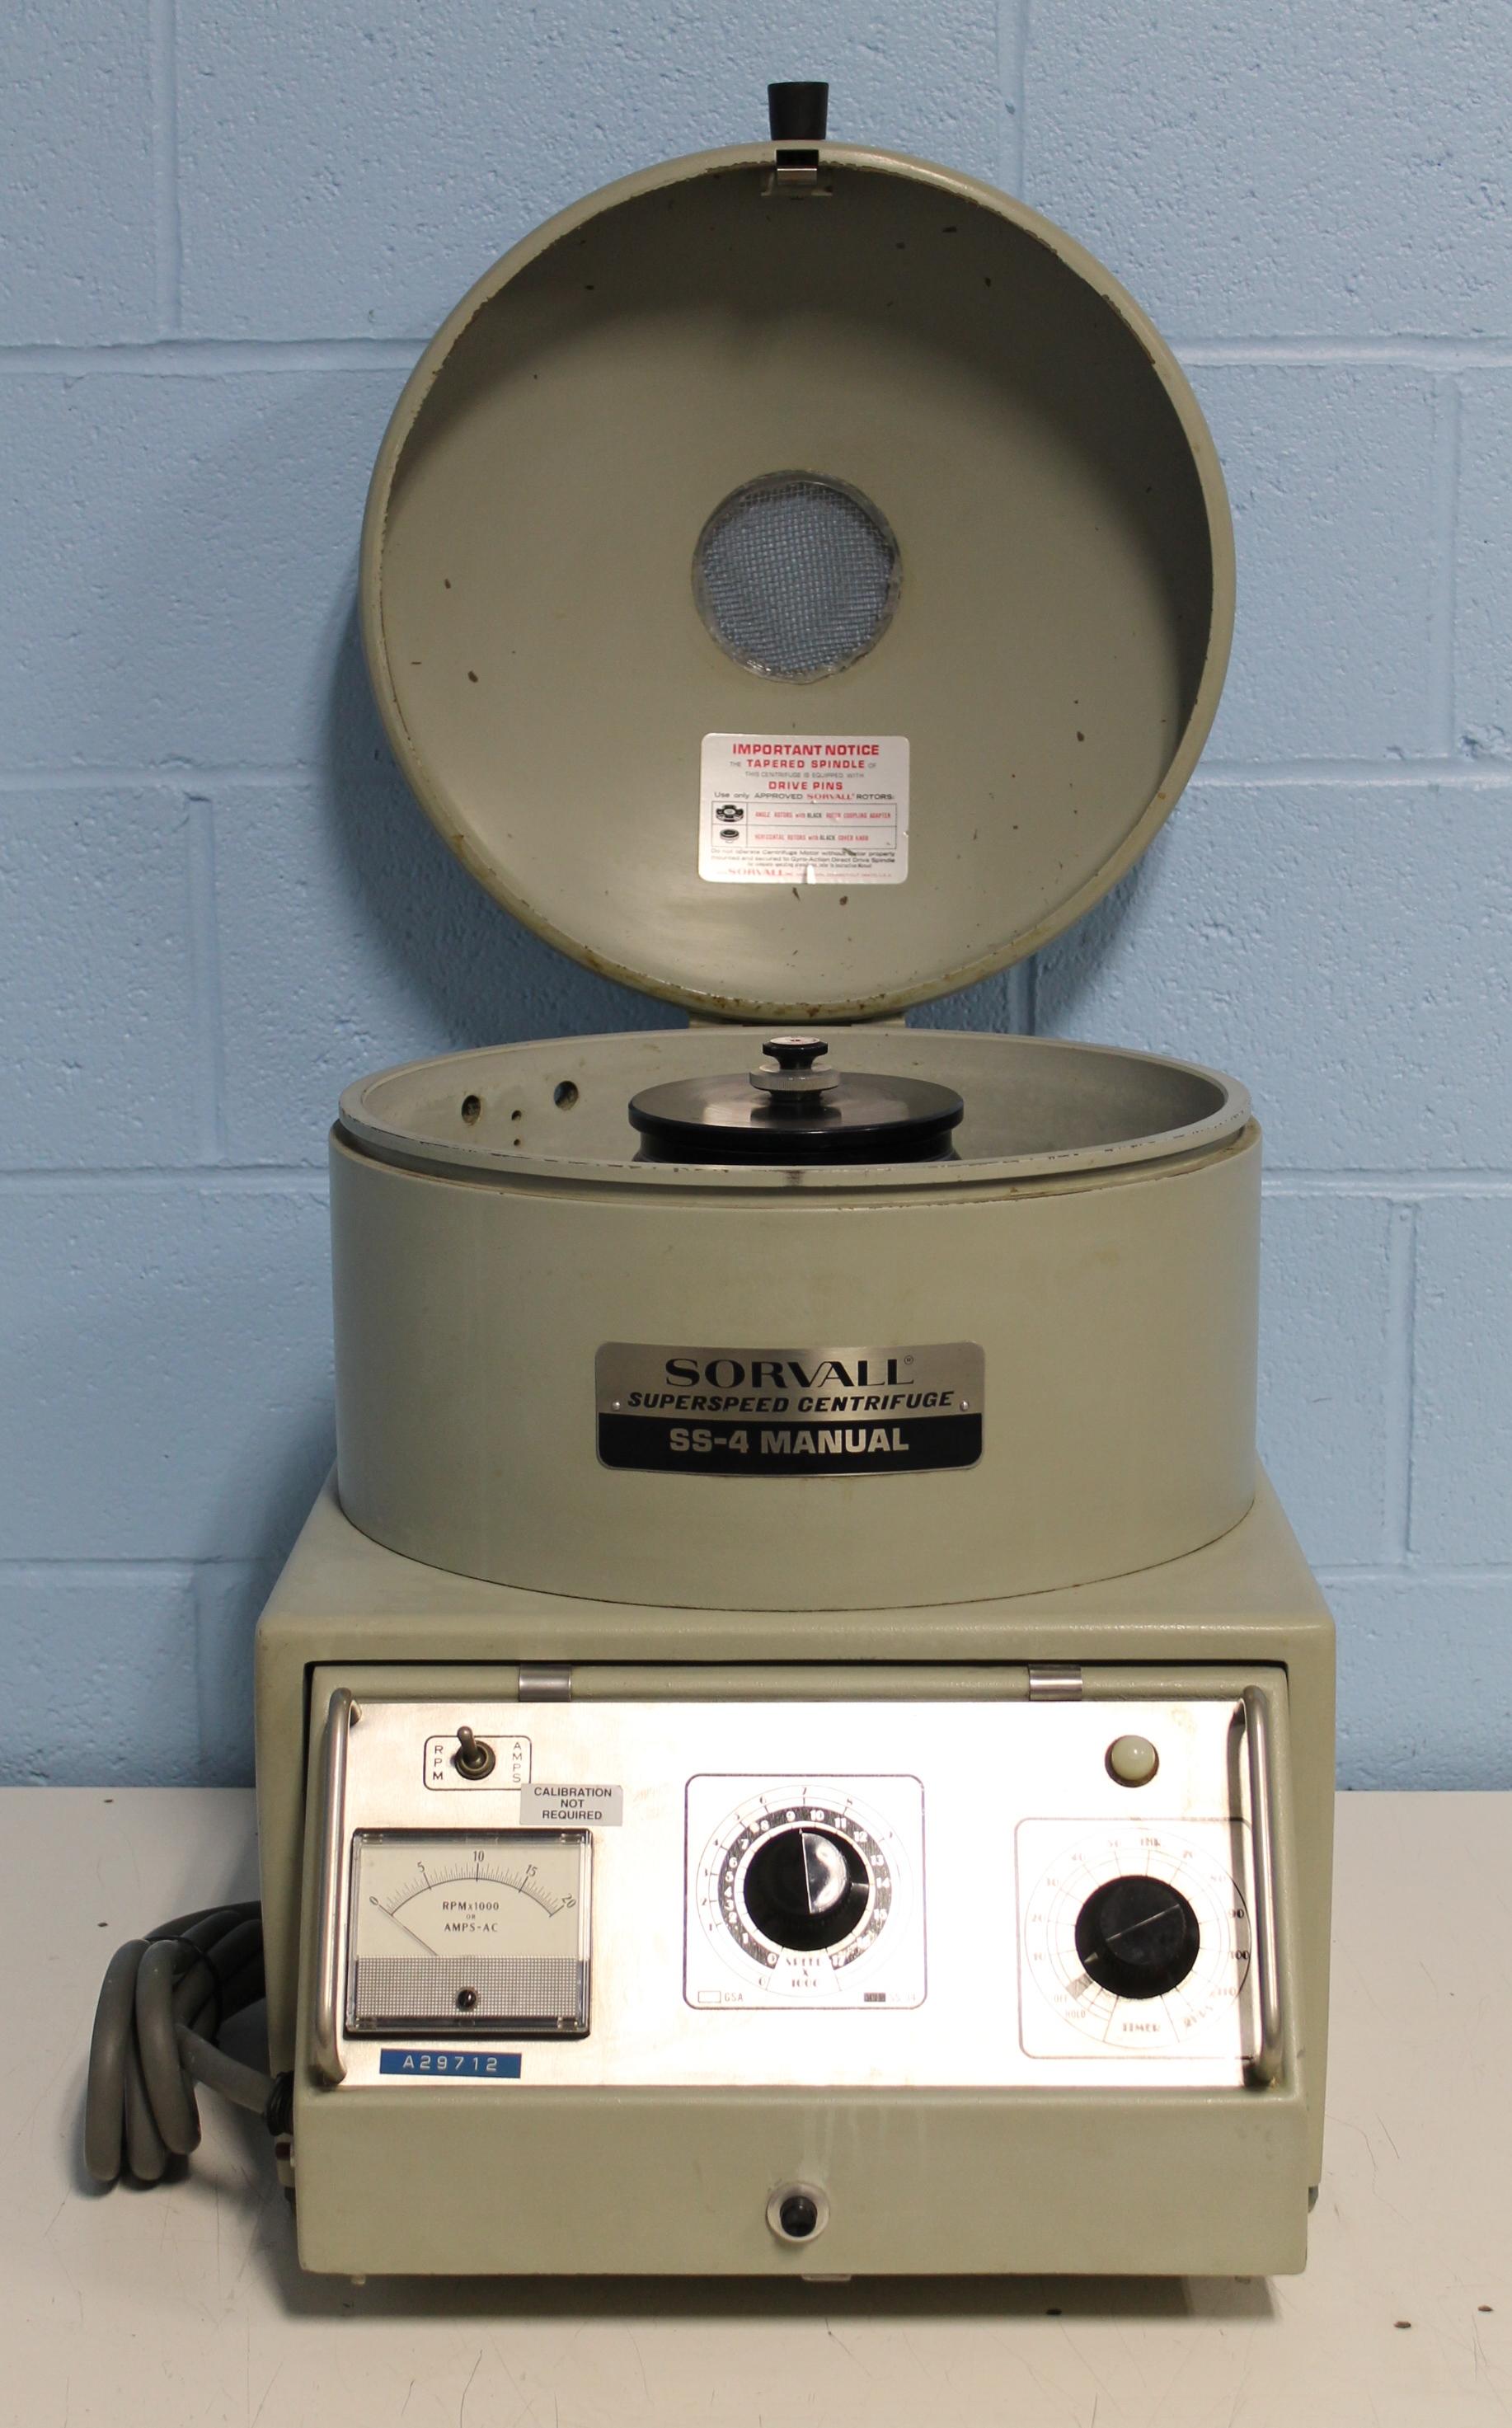 Sorvall Superspeed Centrifuge Model SS-4 Manual Image